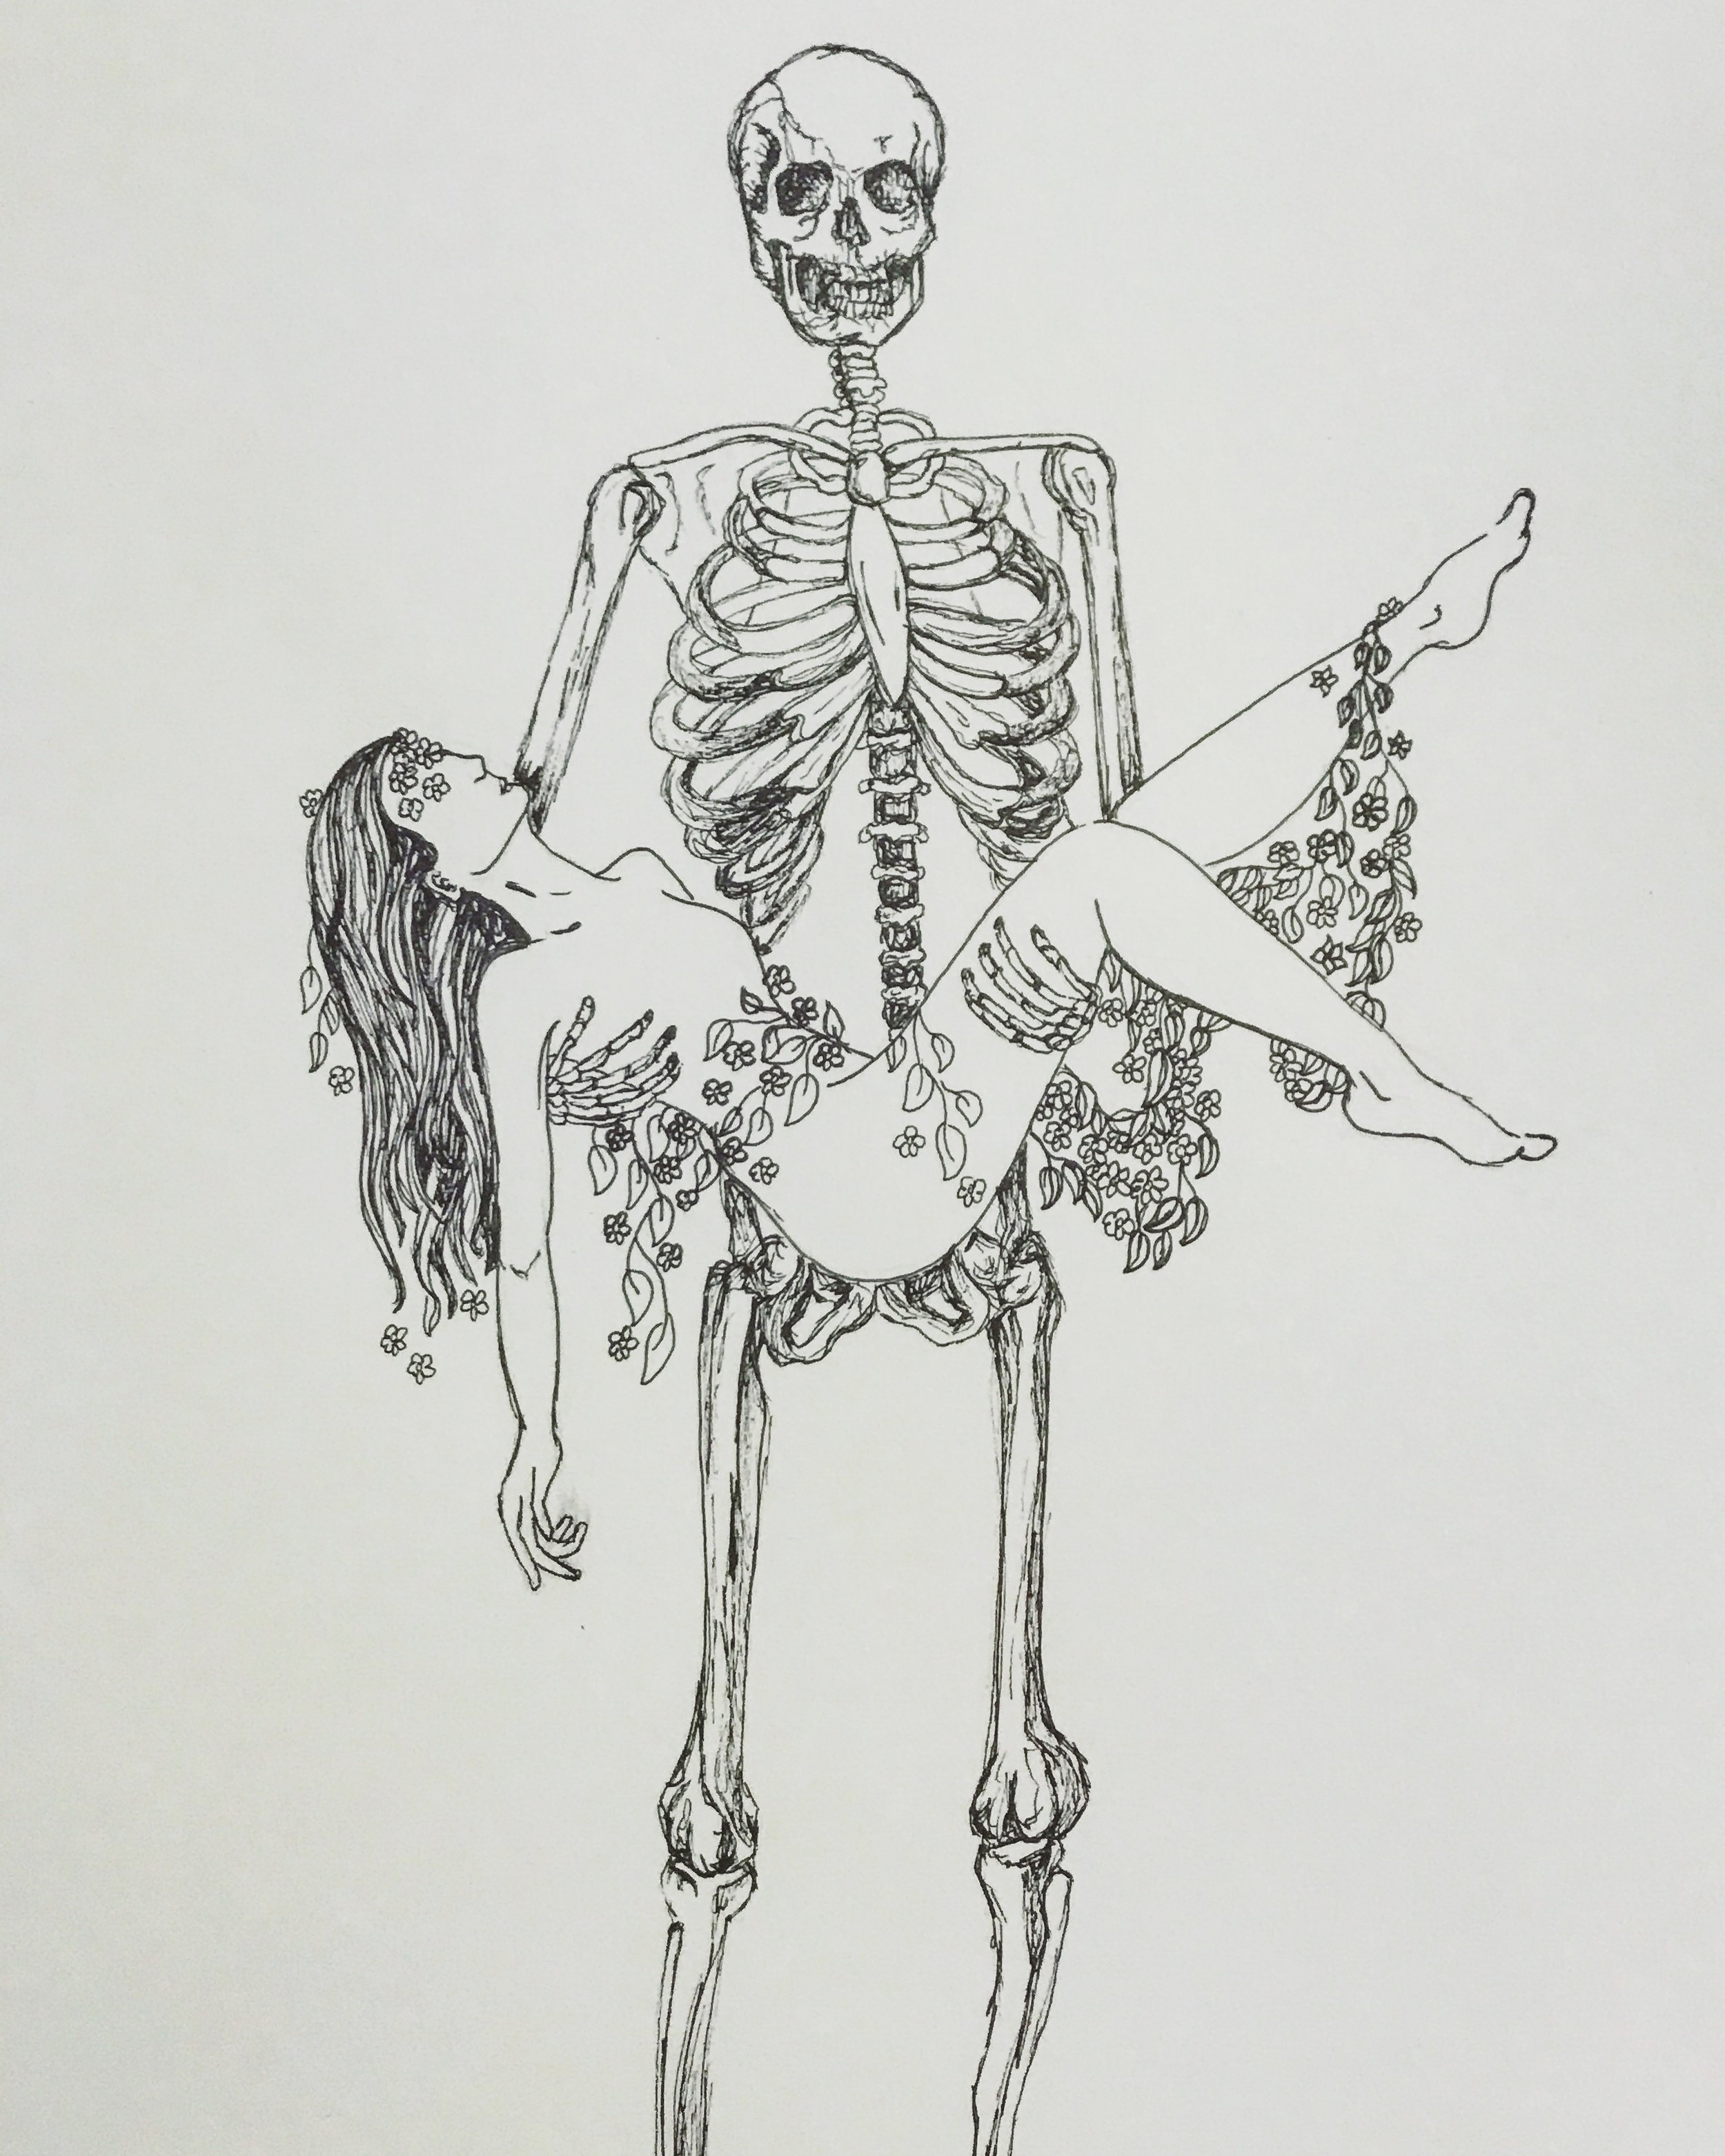 ~artwork by natalia mesa